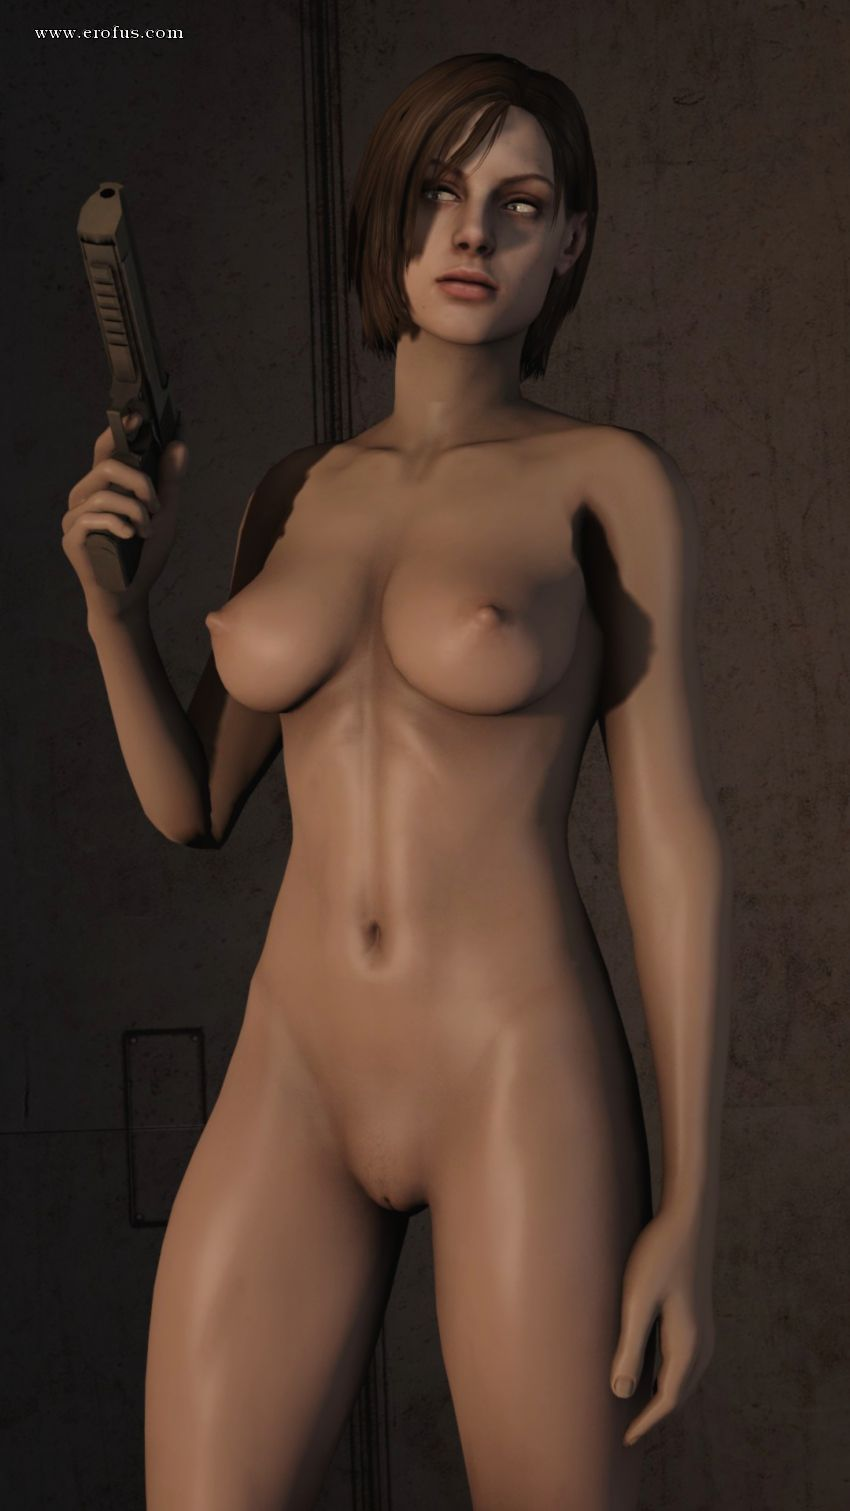 Moira burton nude